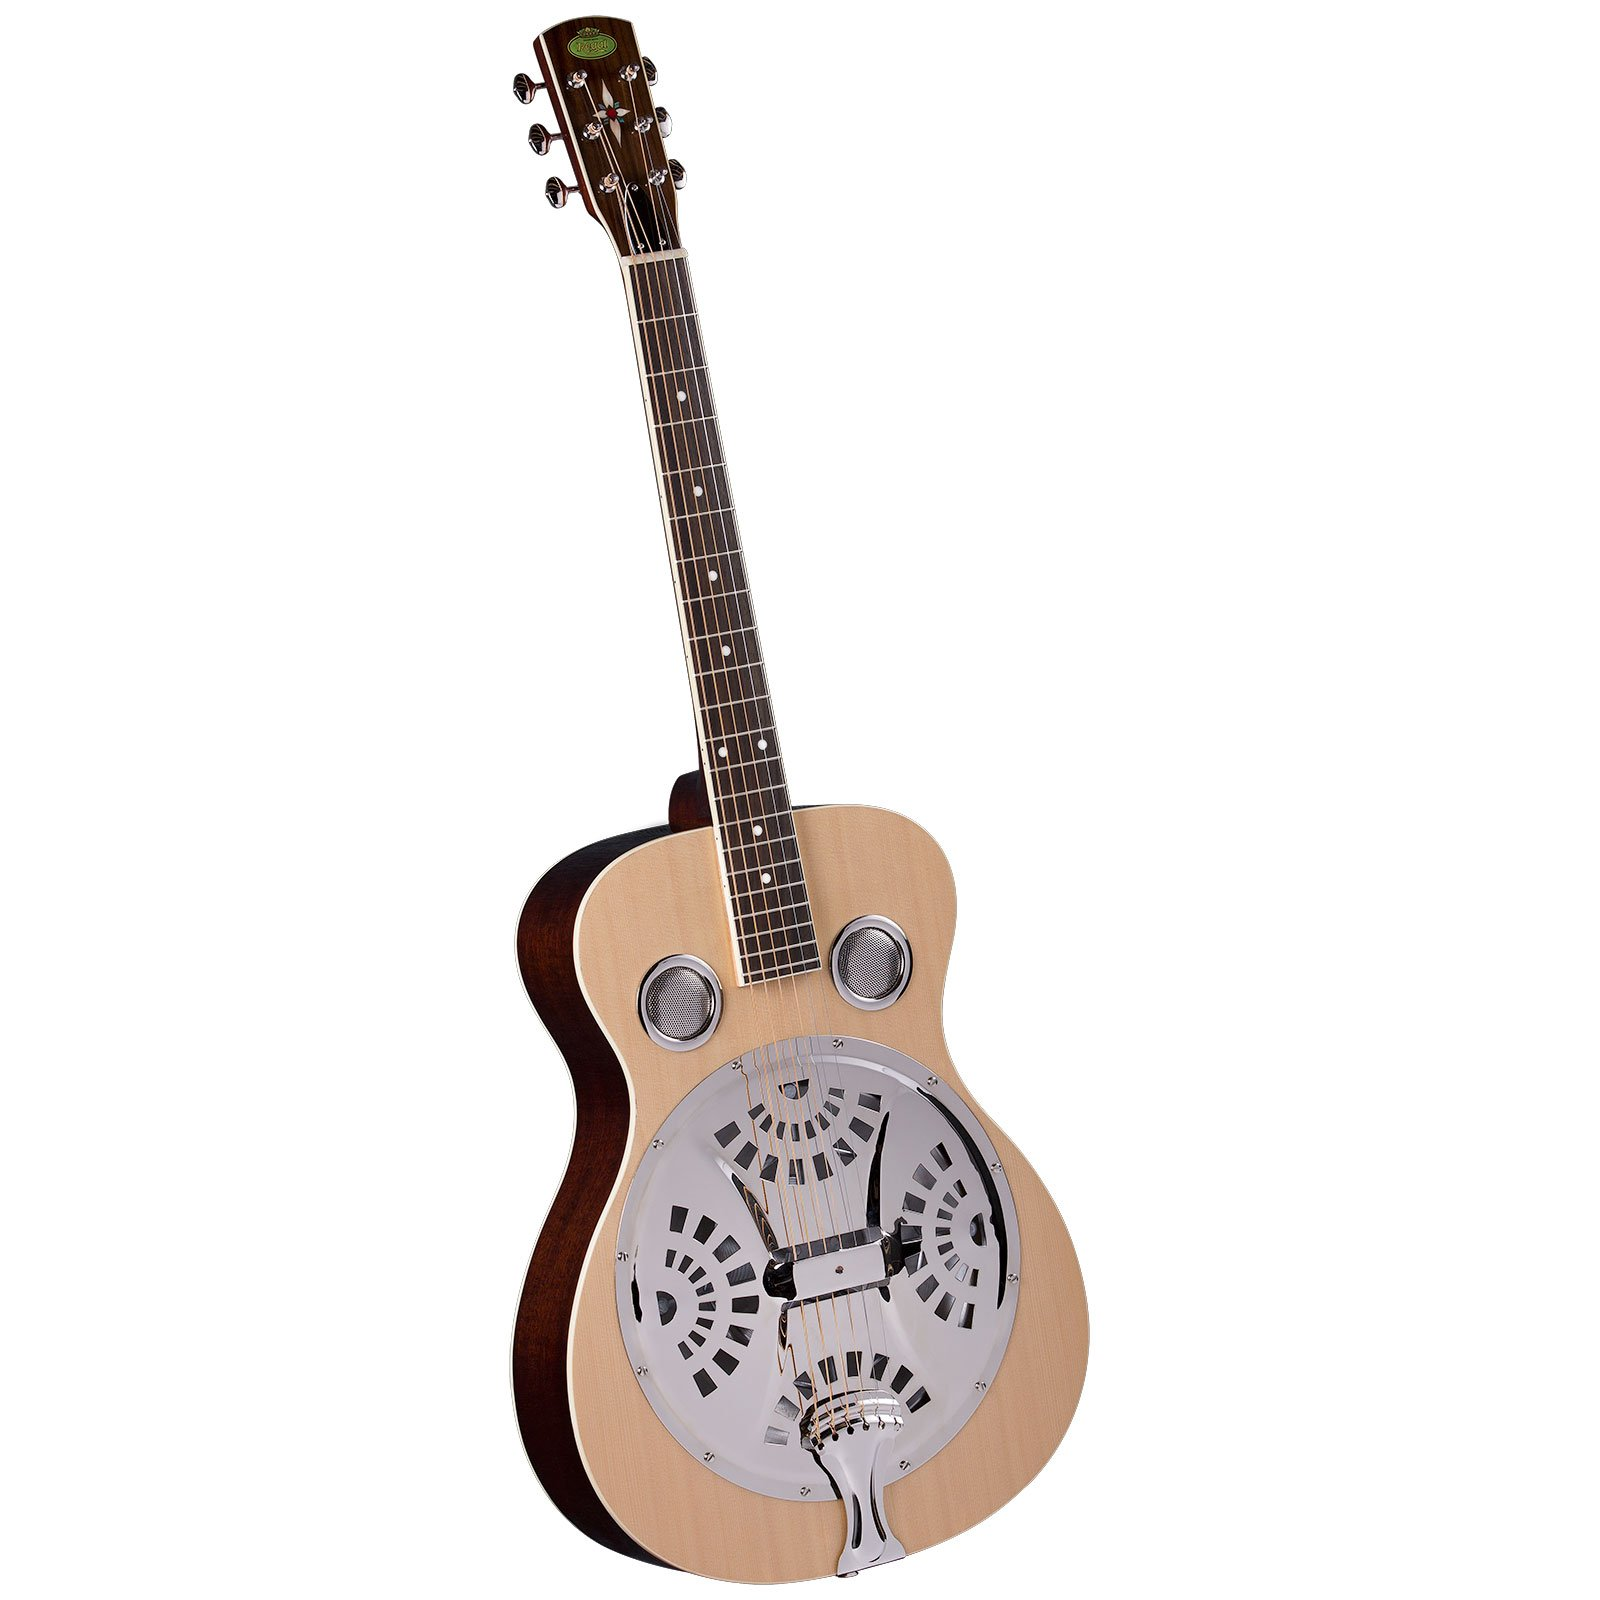 Regal RD-40N Studio Series Roundneck Resophonic Guitar - Natural by Regal Resophonic Guitars